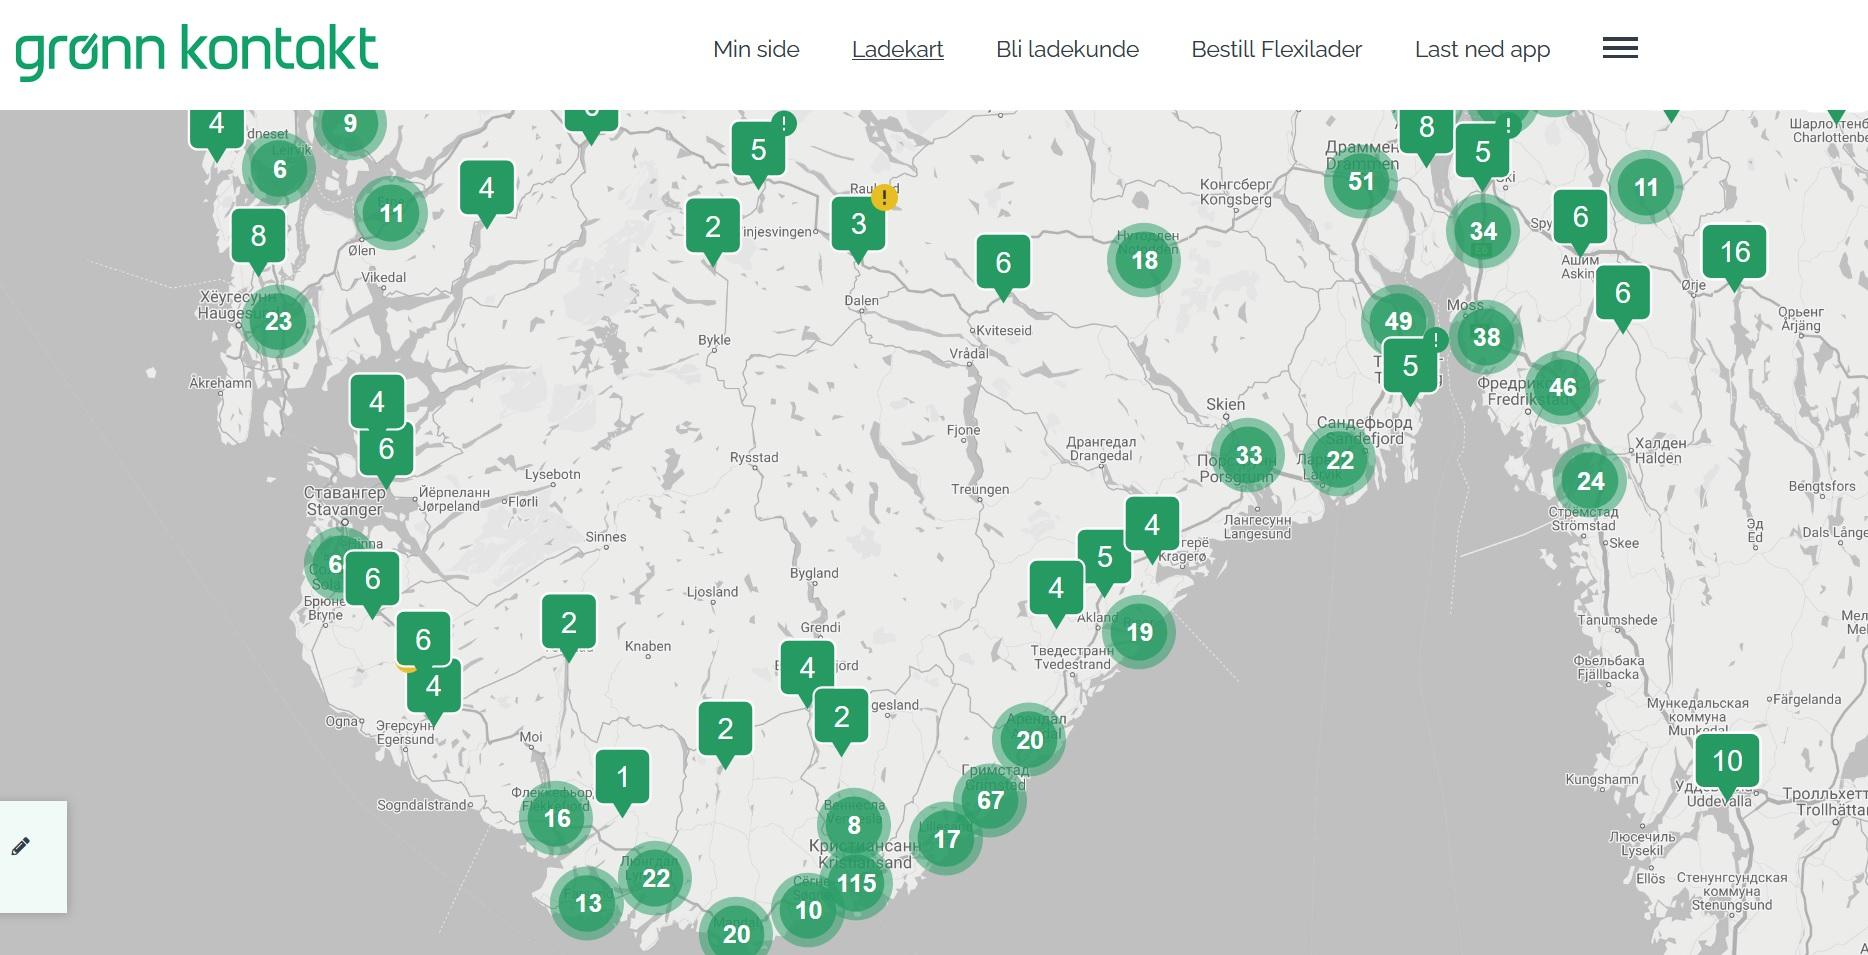 Карта станций зарядки с https://gronnkontakt.no/ladekart/